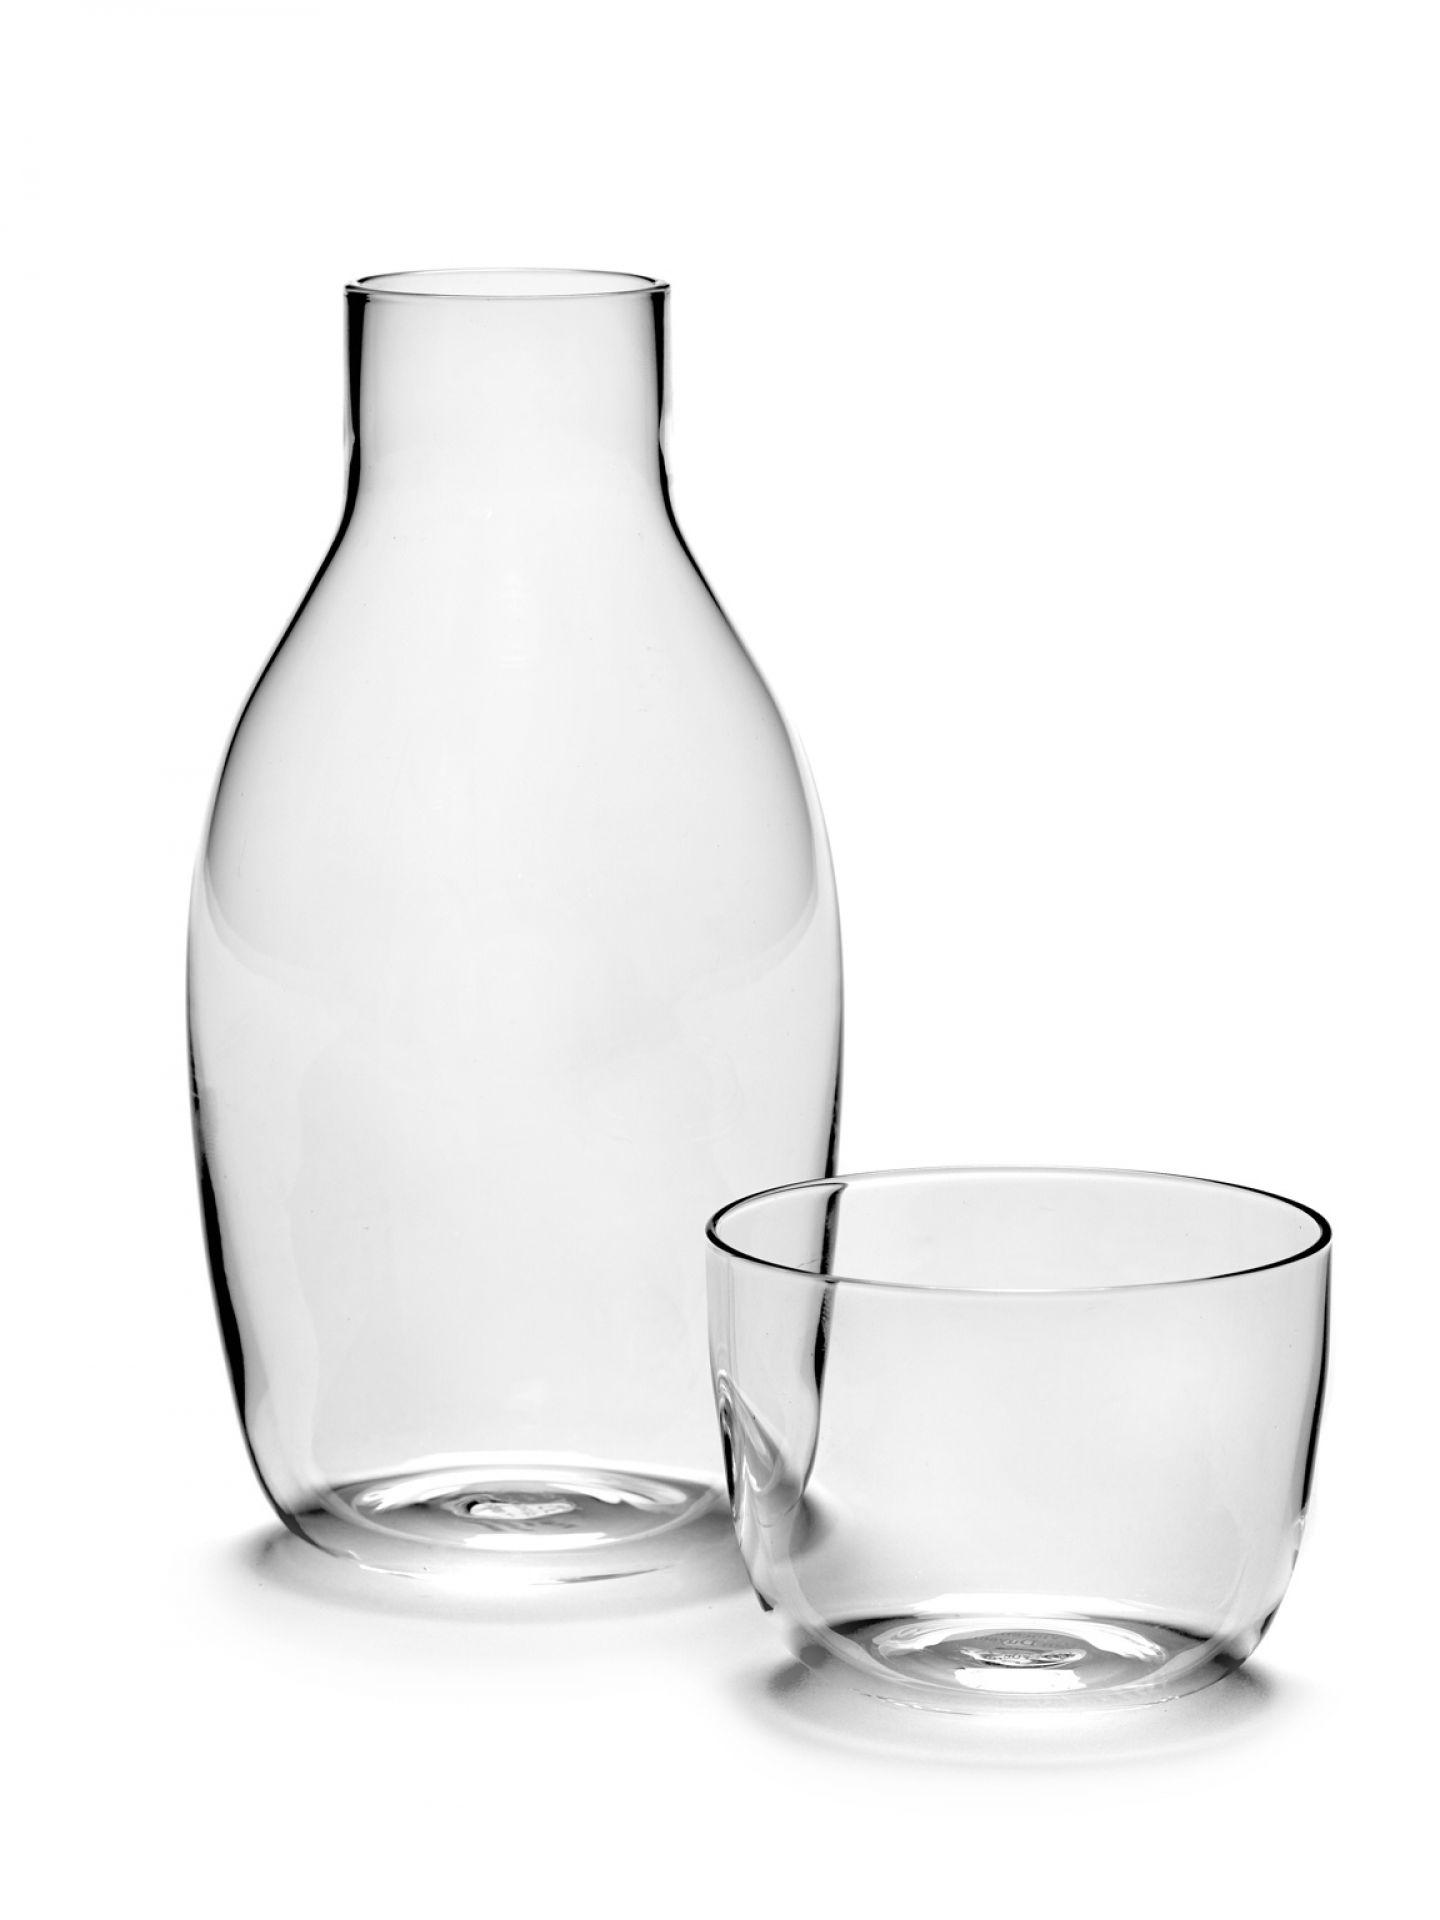 VVD Carafe with glass Serax